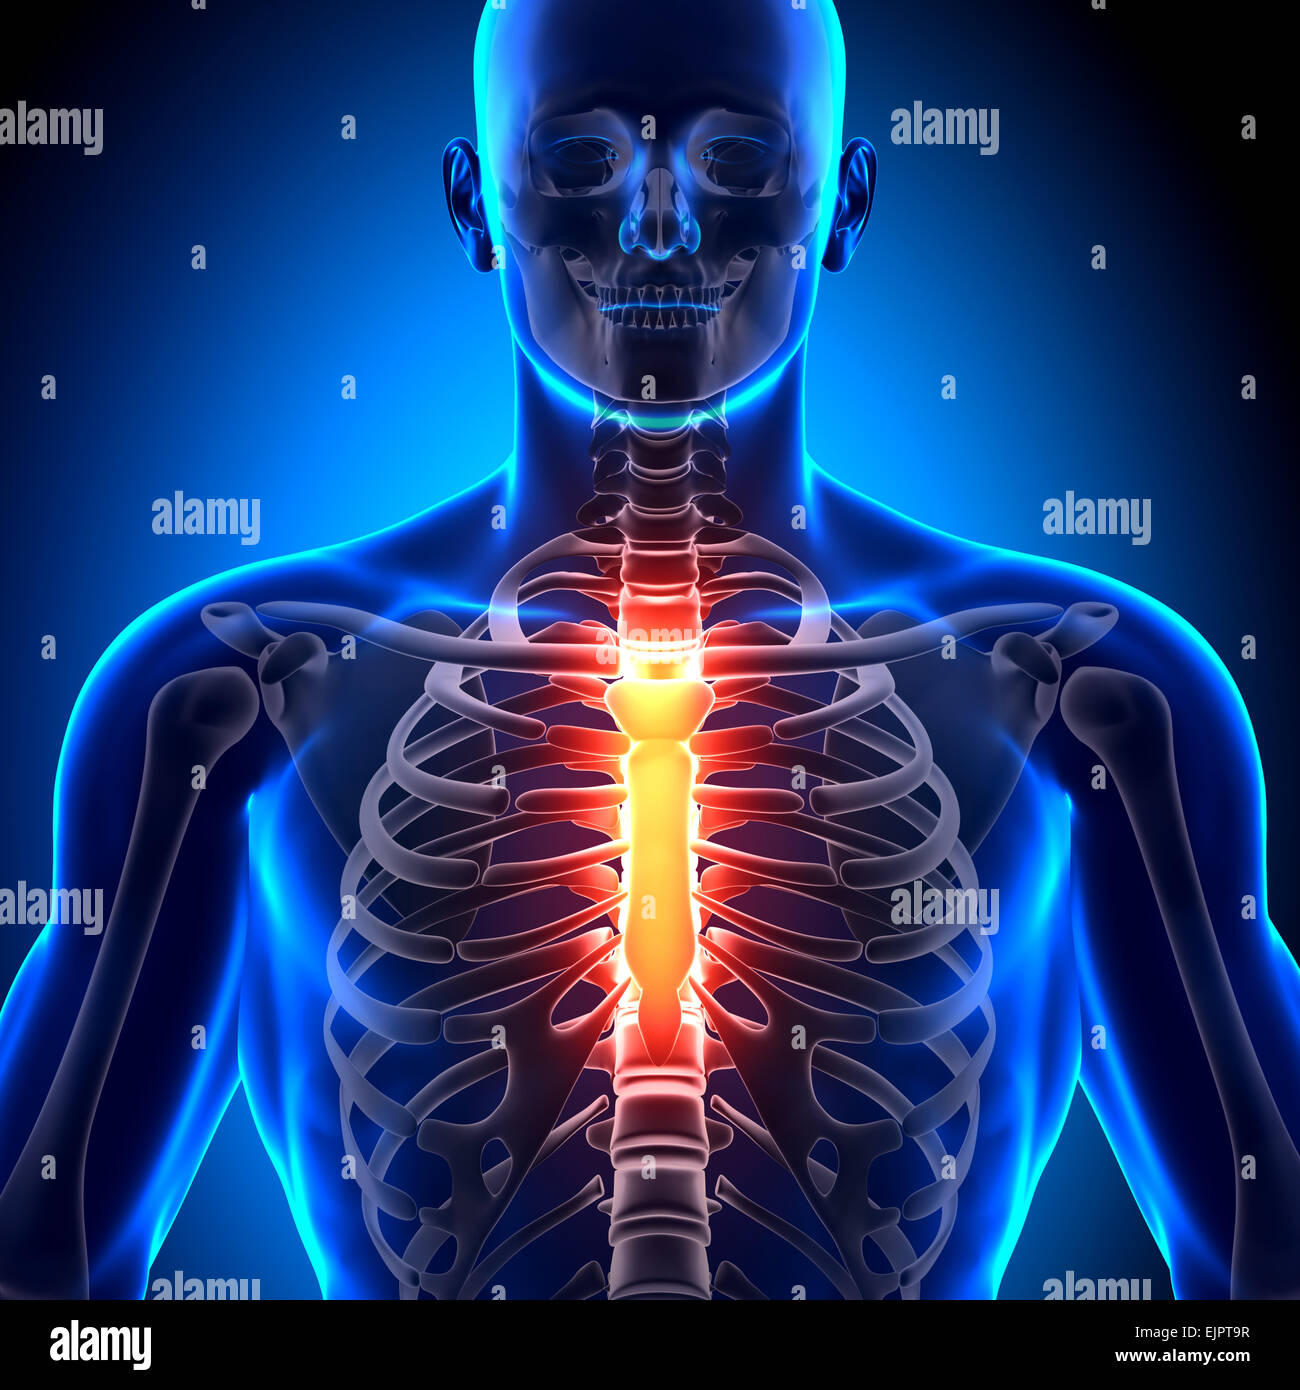 Brustbein - Anatomie-Knochen Stockfoto, Bild: 80407315 - Alamy